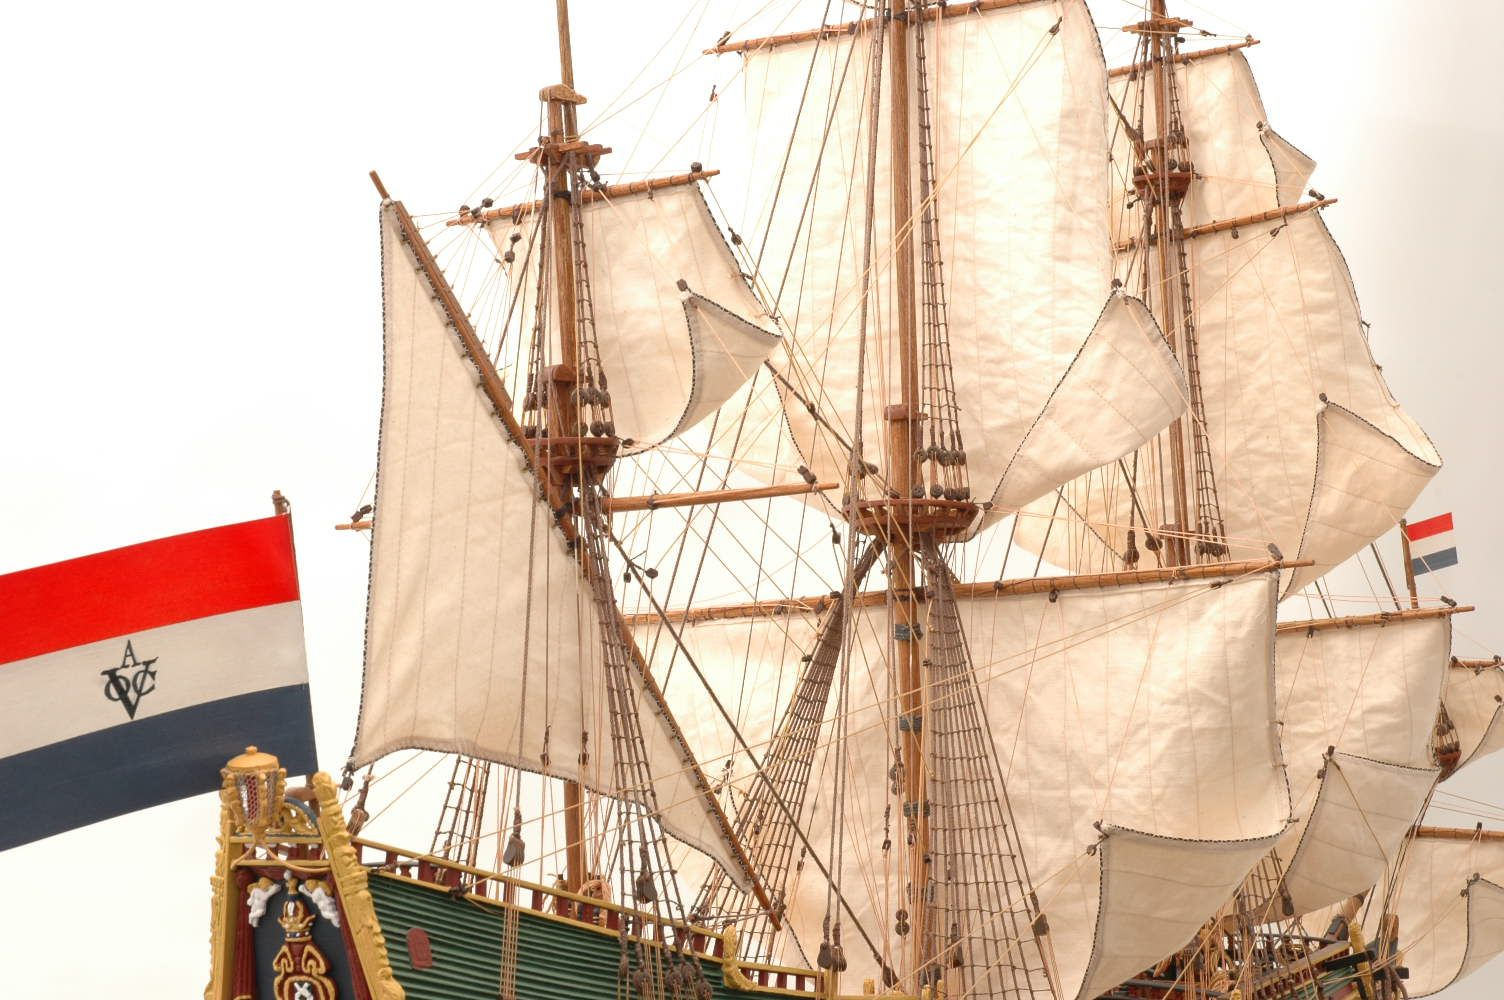 228-6954-Batavia-model-ship-Premier-Range